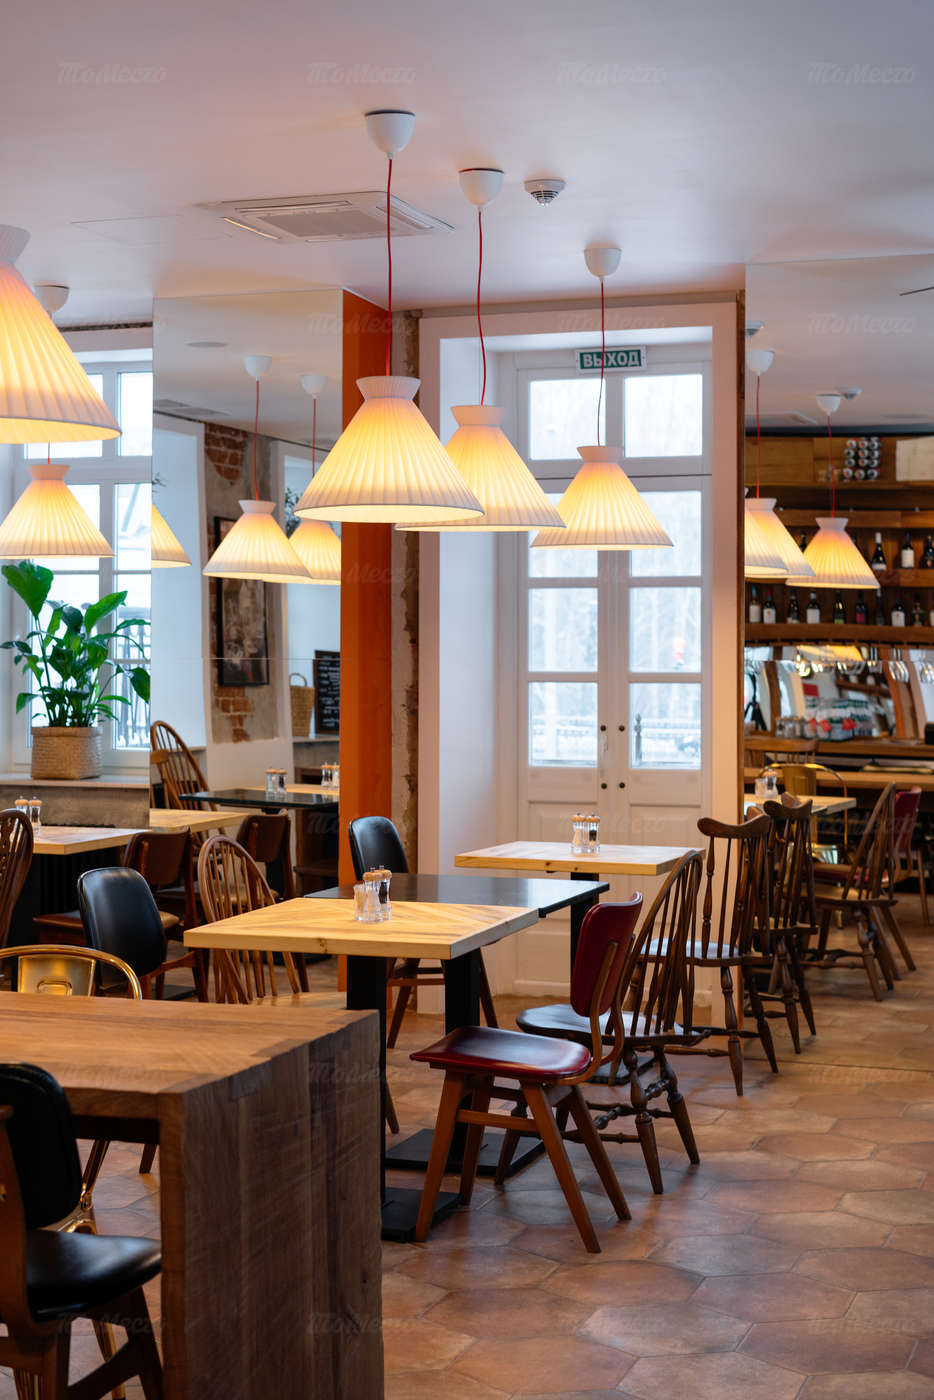 Ресторан Pinzeria by Bontempi (Пинцерия Бонтемпи) на Верх-Исетском бульваре